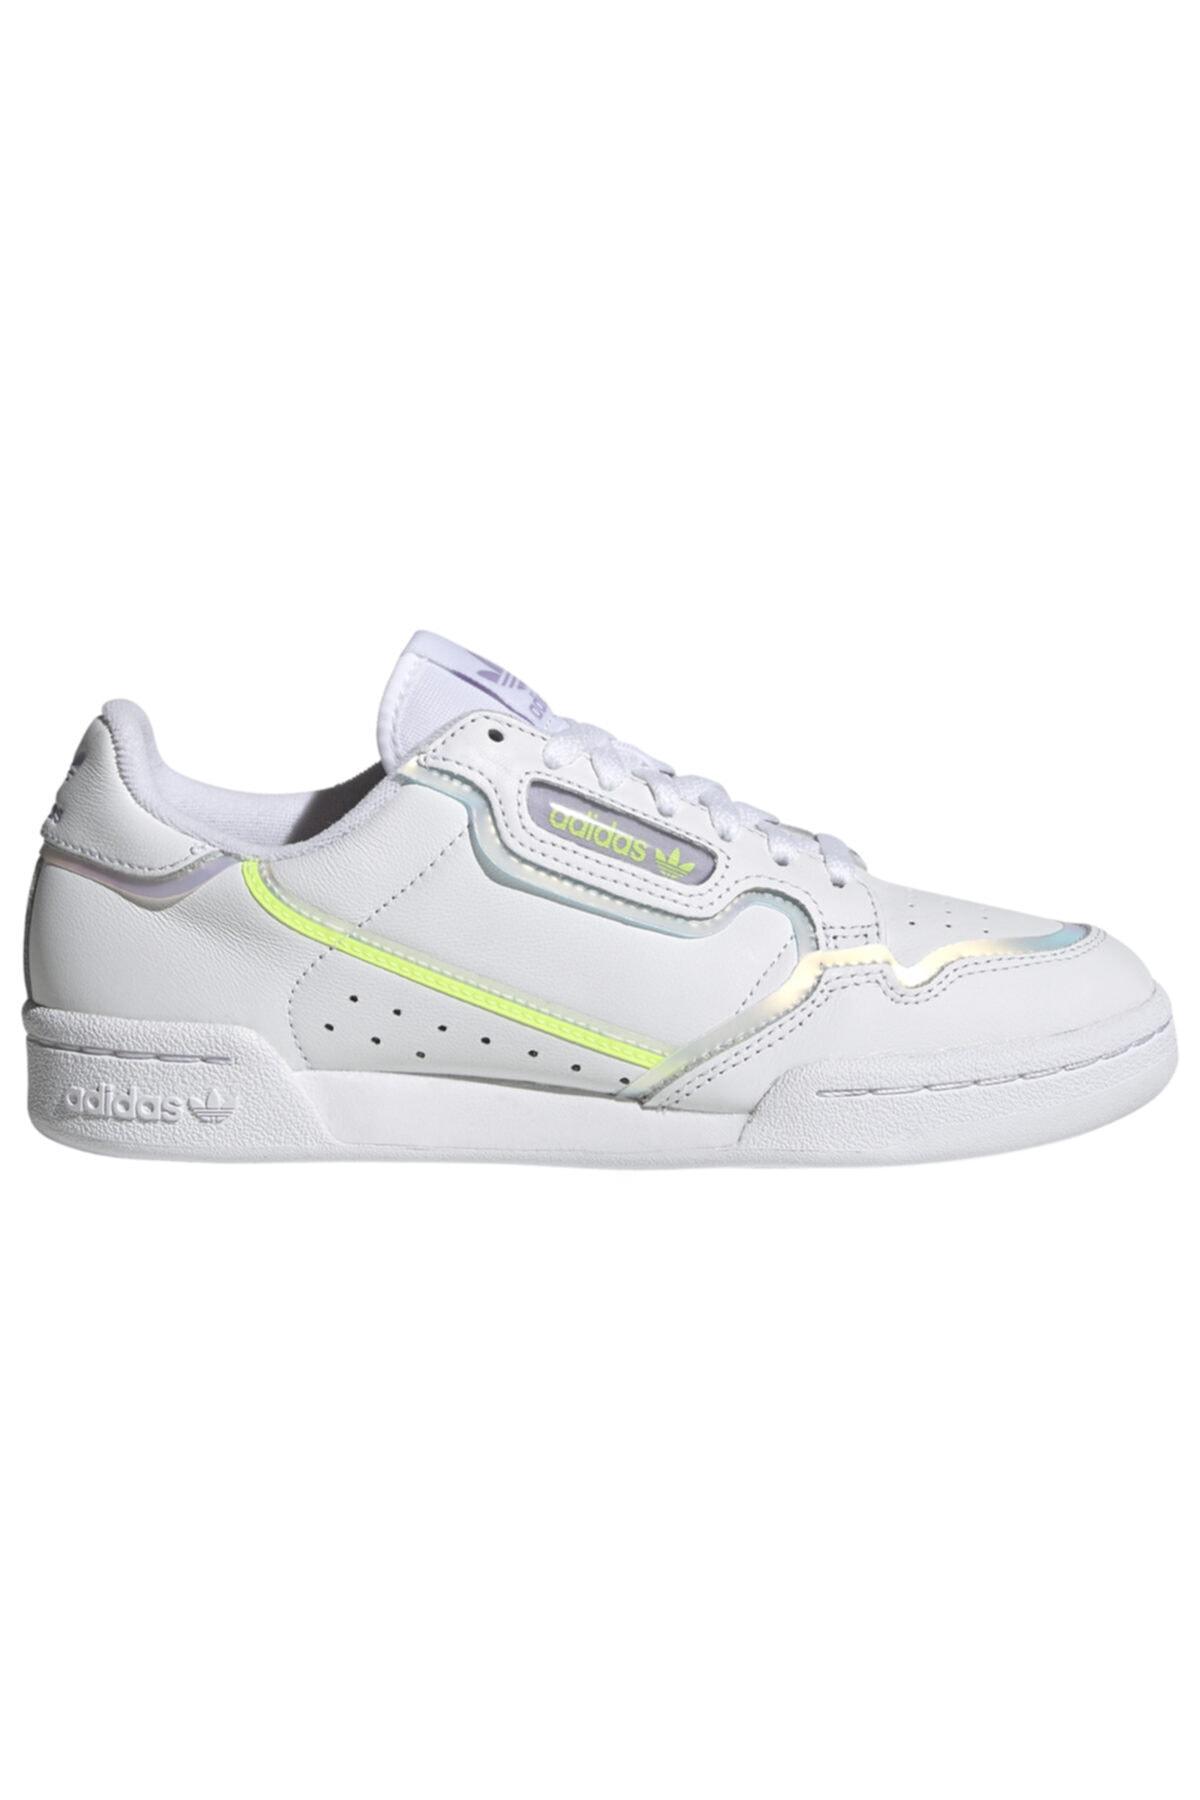 adidas Continental 80 Kadın Spor Ayakkabı 1